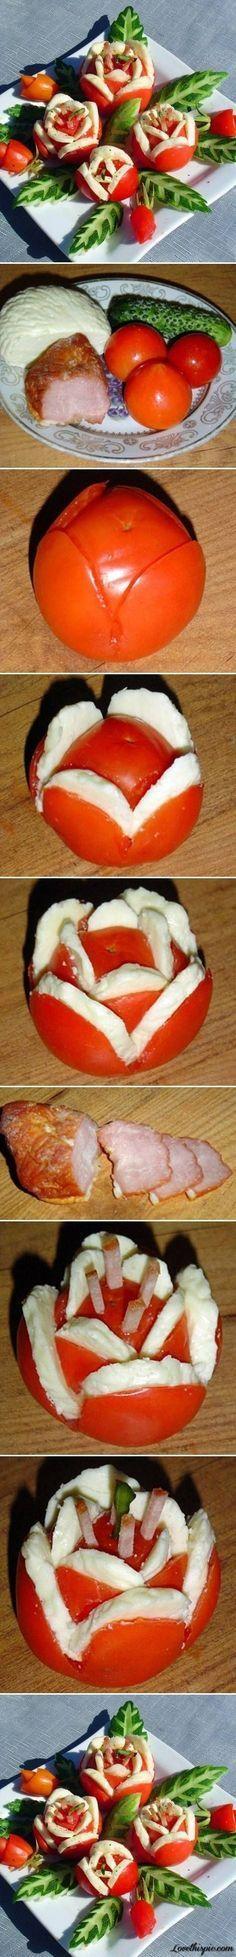 DIY Tomato Platter diy  easy diy diy food diy dinner diy food art